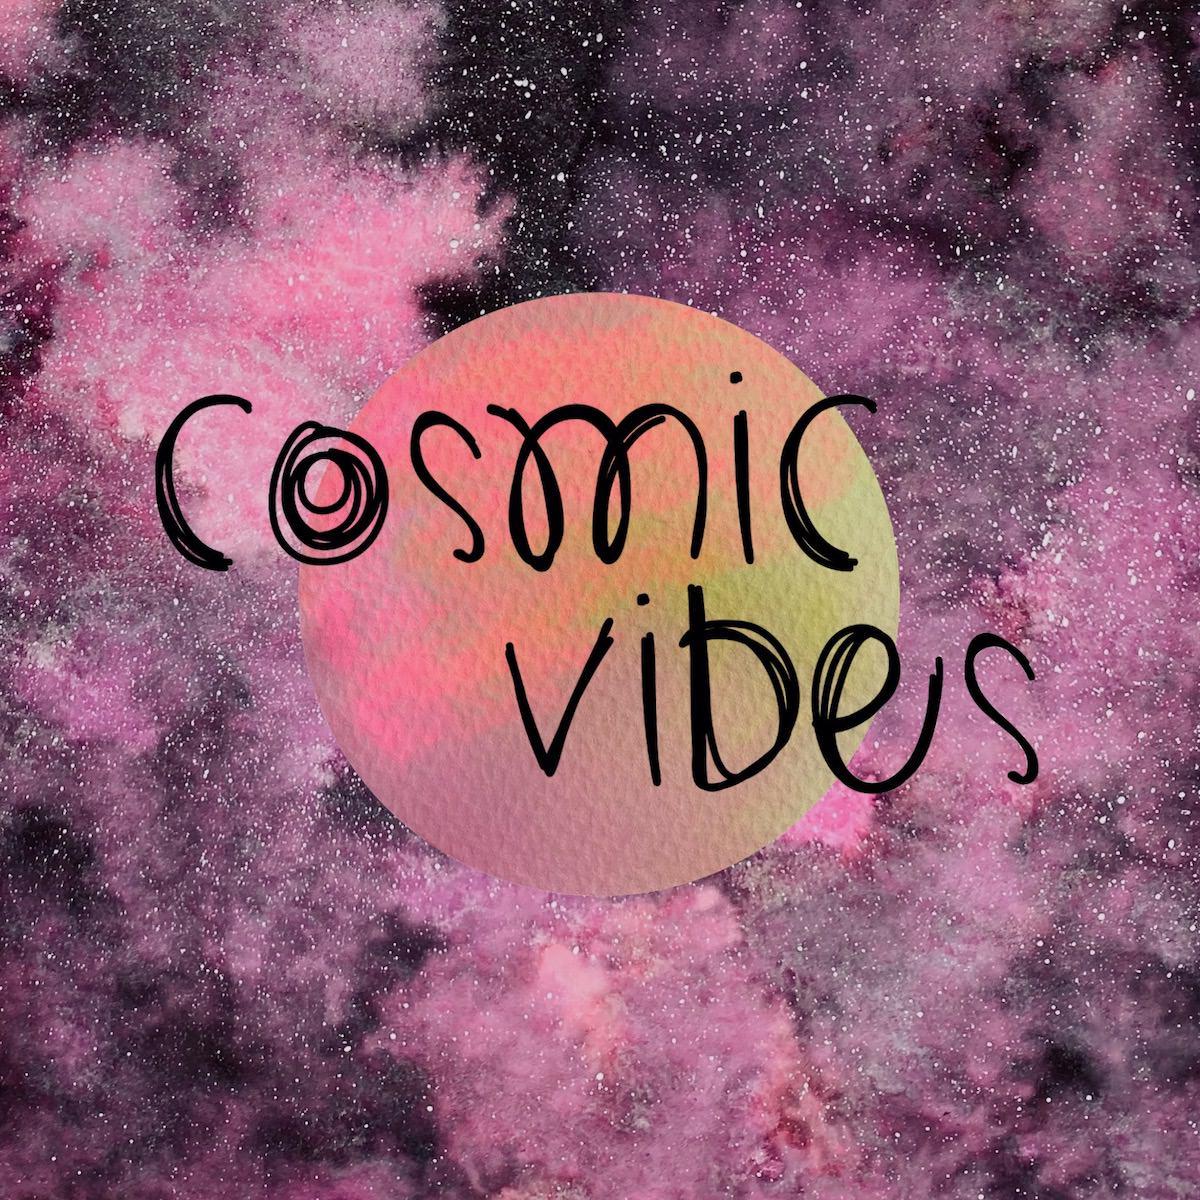 Sagt Hi zu Cosmic Vibes